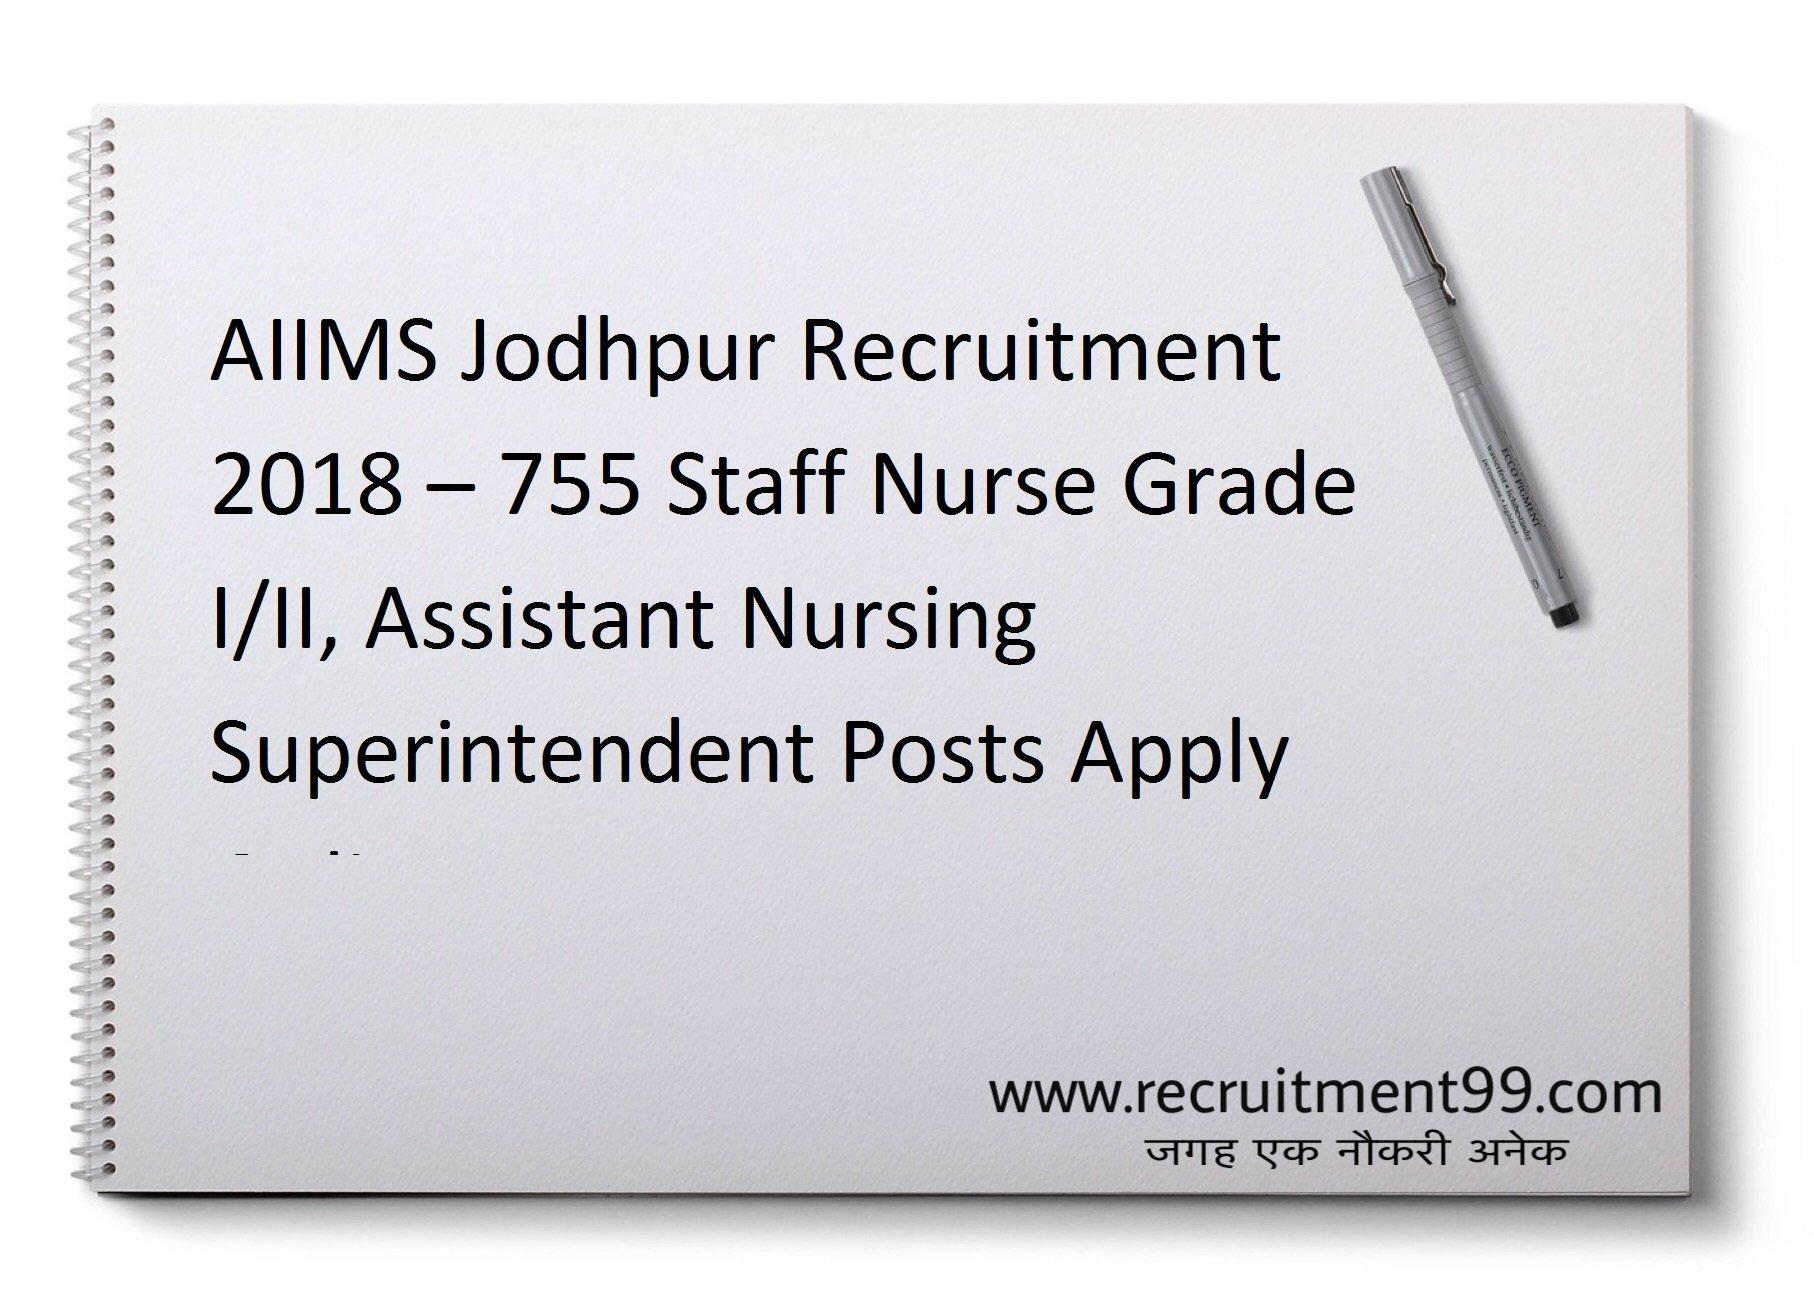 AIIMS Jodhpur Recruitment 2018 – 755 Staff Nurse Grade I/II, Assistant Nursing Superintendent Posts Apply Online